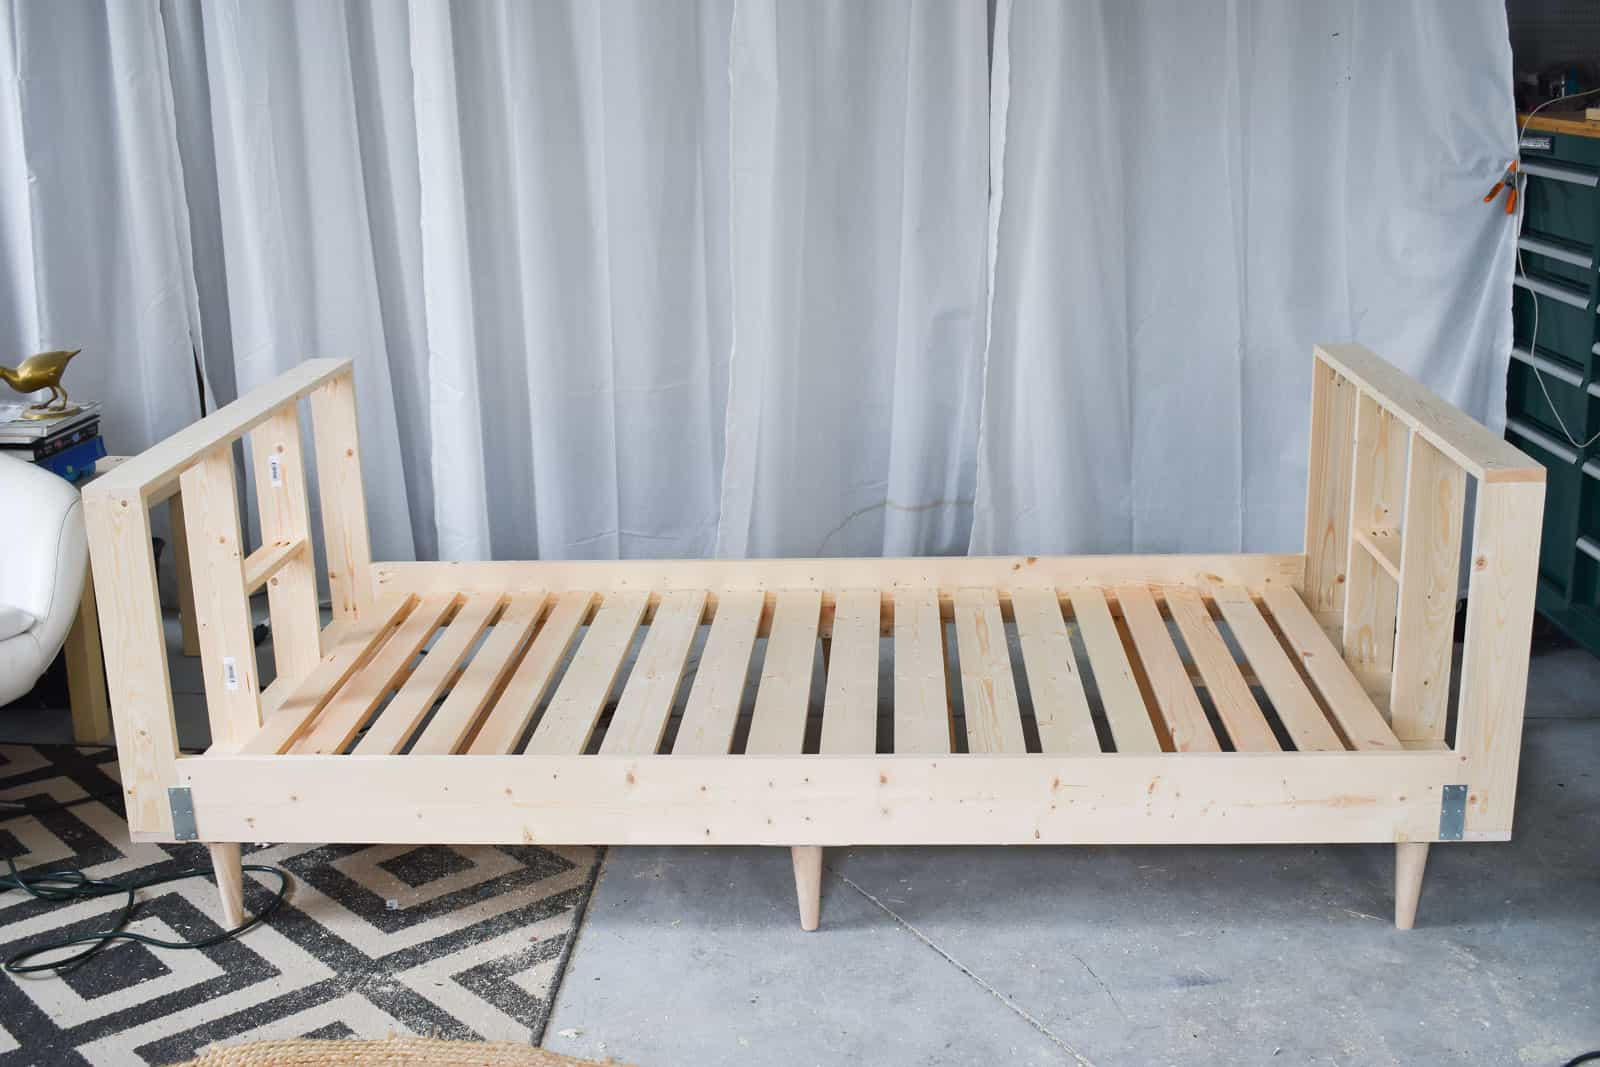 diy daybed sofas l shape sofa set with storage upholstered frame at charlotte s house finished